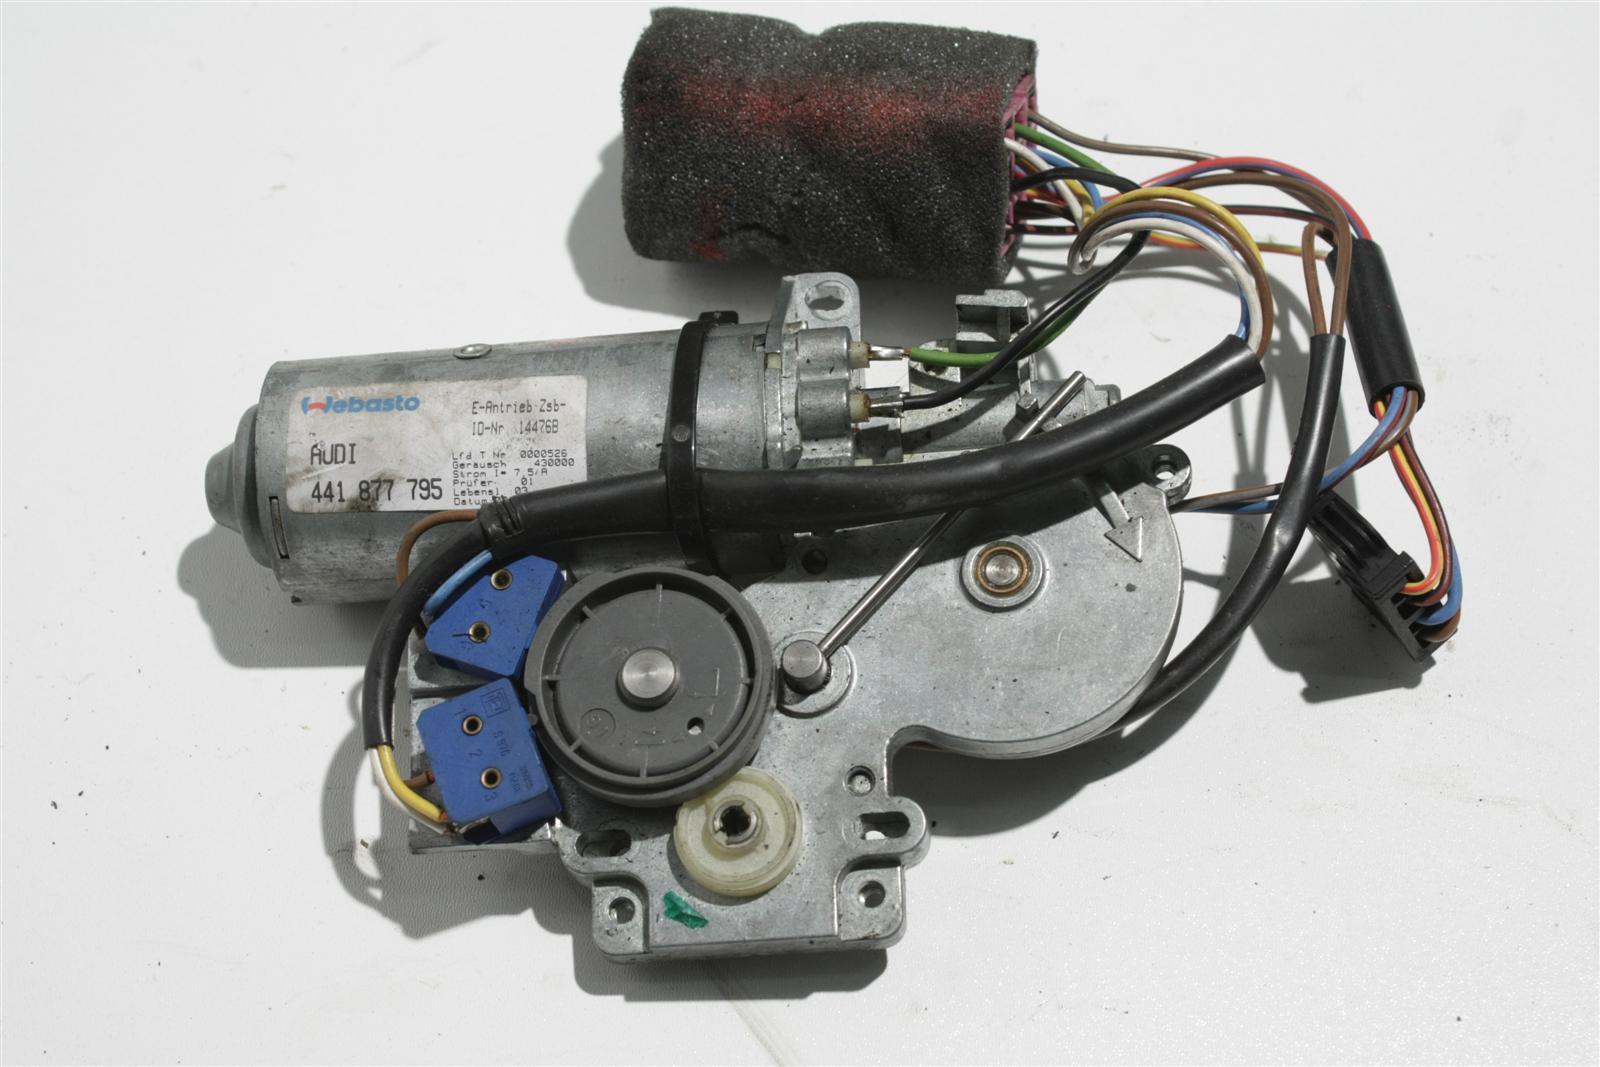 Audi V8 D11 Schiebedachmotor Webasto 441877795